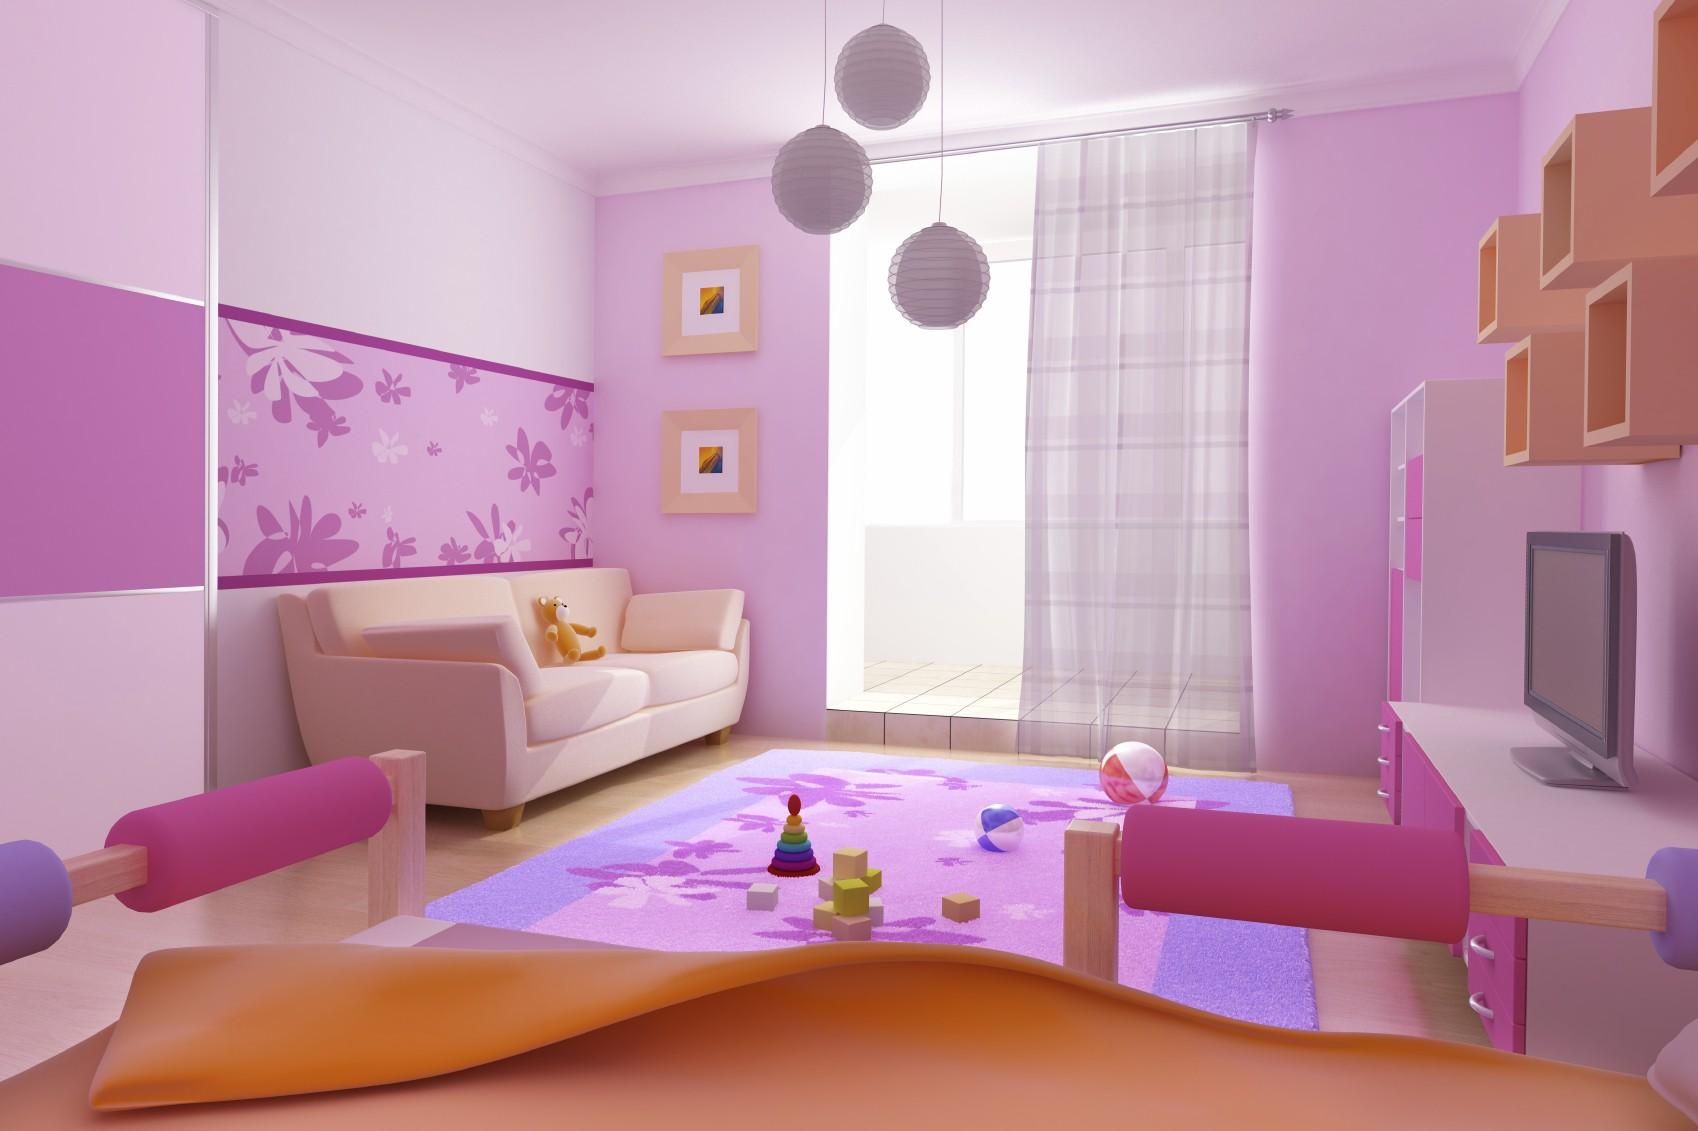 6 Tips Untuk Memilih Warna Bilik Tidur Sesuai Anak